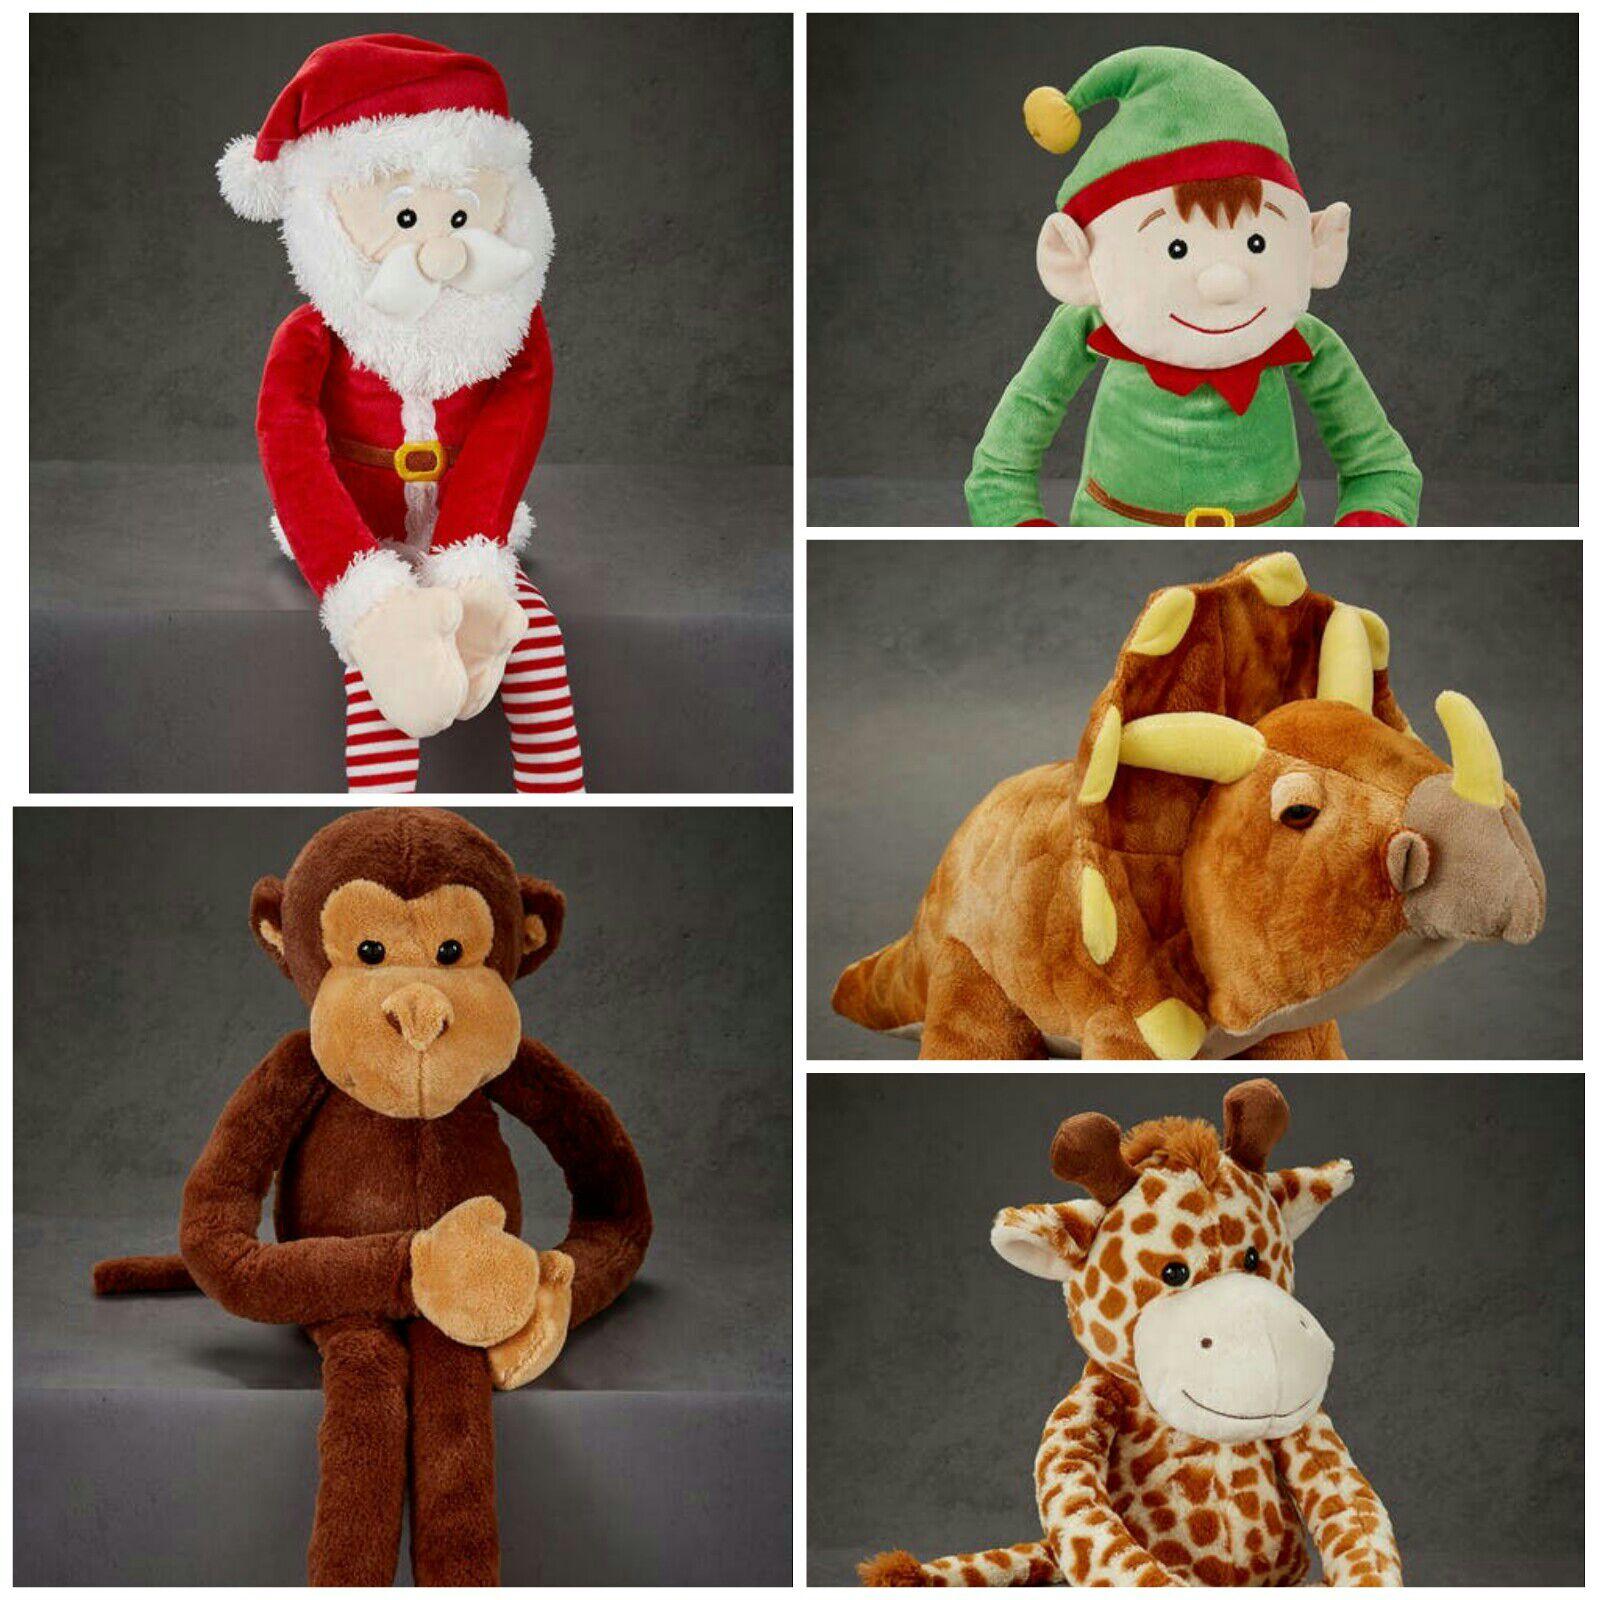 Keel soft toys @ Matalan £5.60 - £7